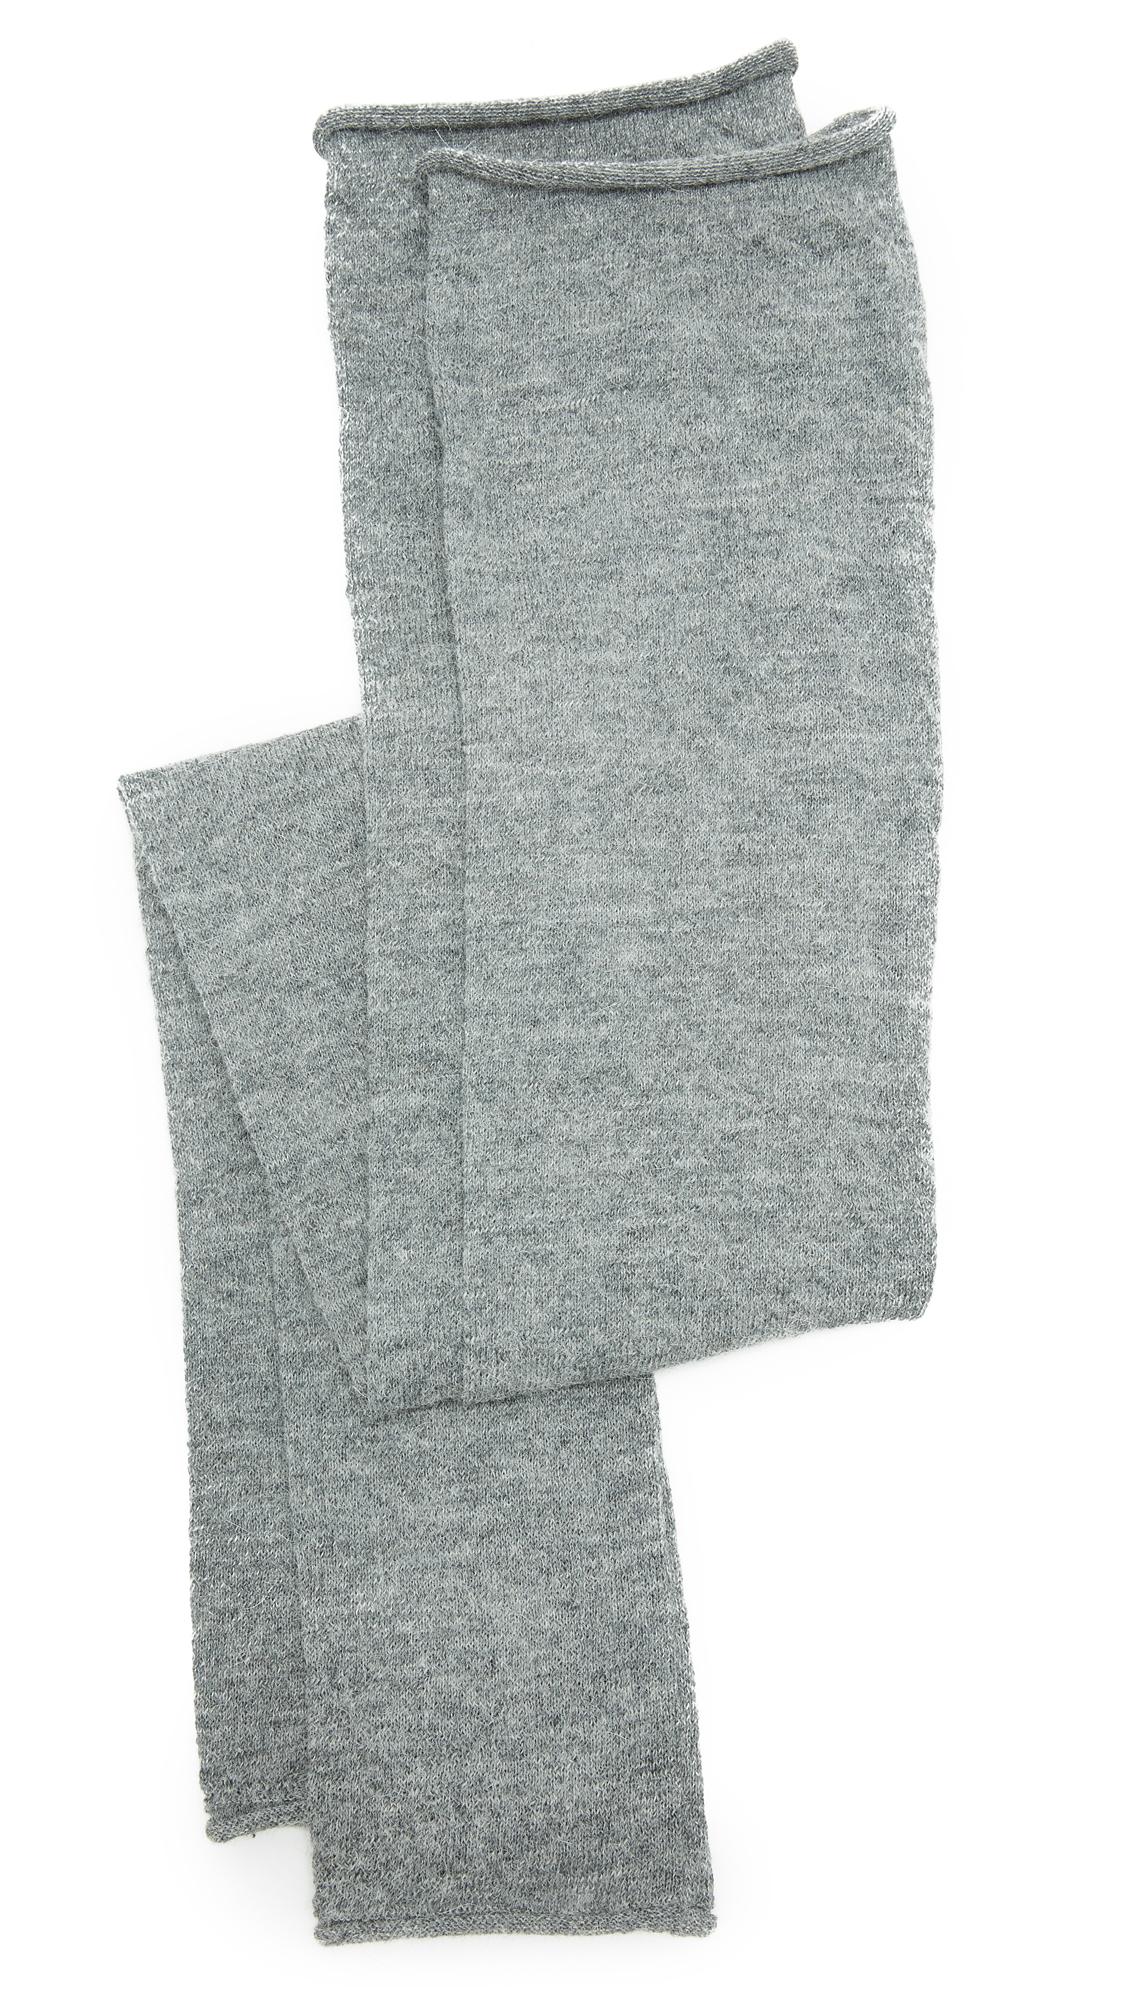 Acne Studios Large Jill Alpaca Leg Warmers - Grey Melange at Shopbop